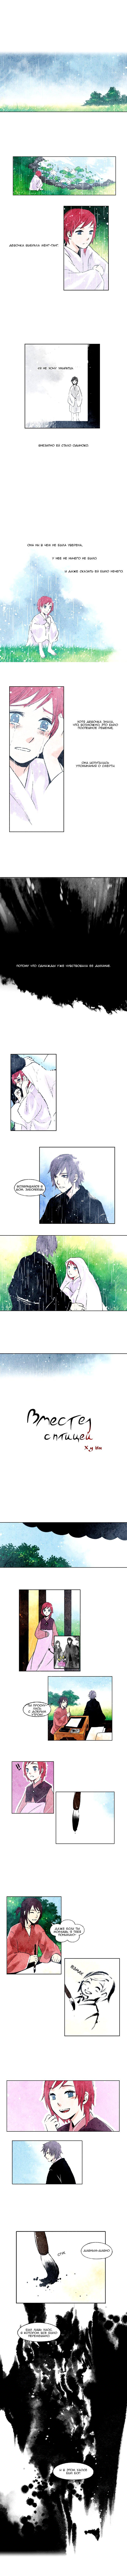 https://r1.ninemanga.com/comics/pic2/39/22503/238788/1430260517315.jpg Page 3